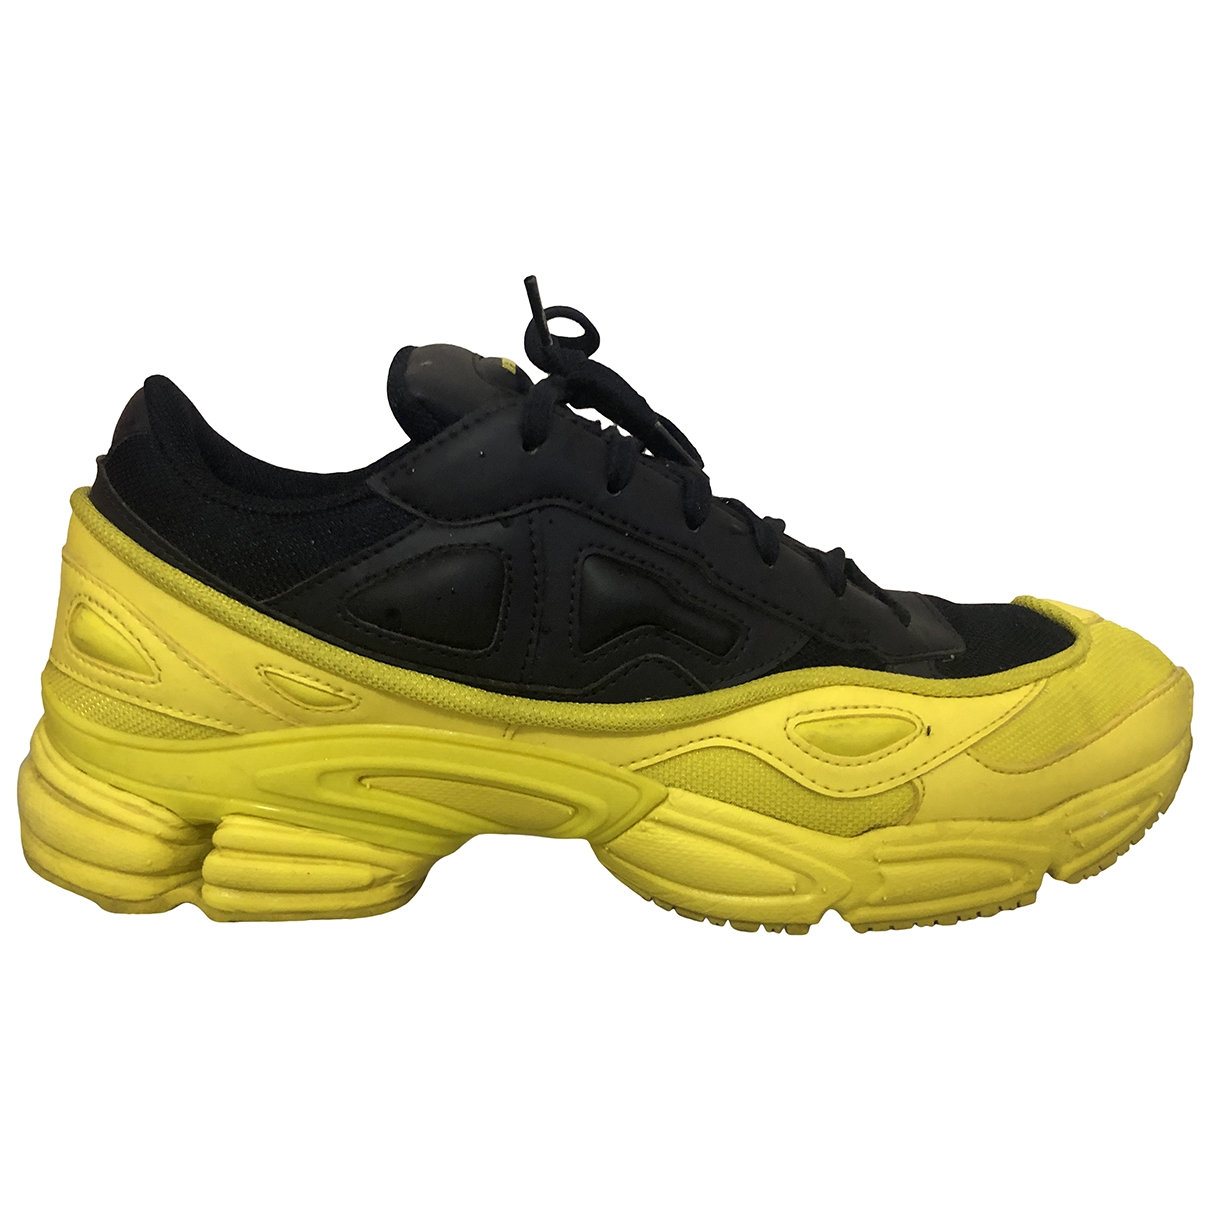 Adidas X Raf Simons Ozweego 2 Cloth Trainers for Men 11.5 UK